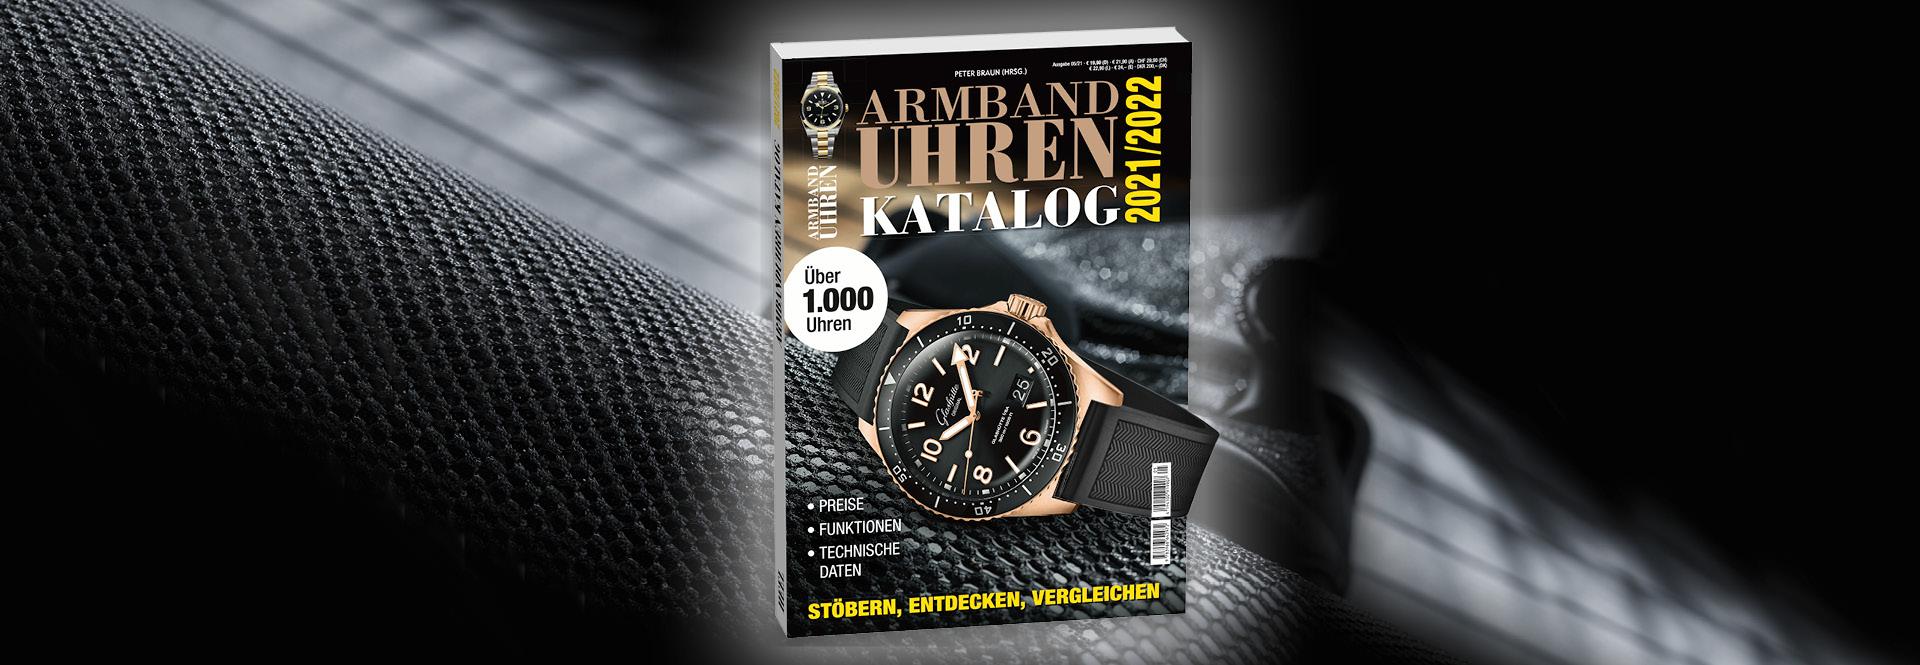 Armbanduhren-Katalog 2021-2022